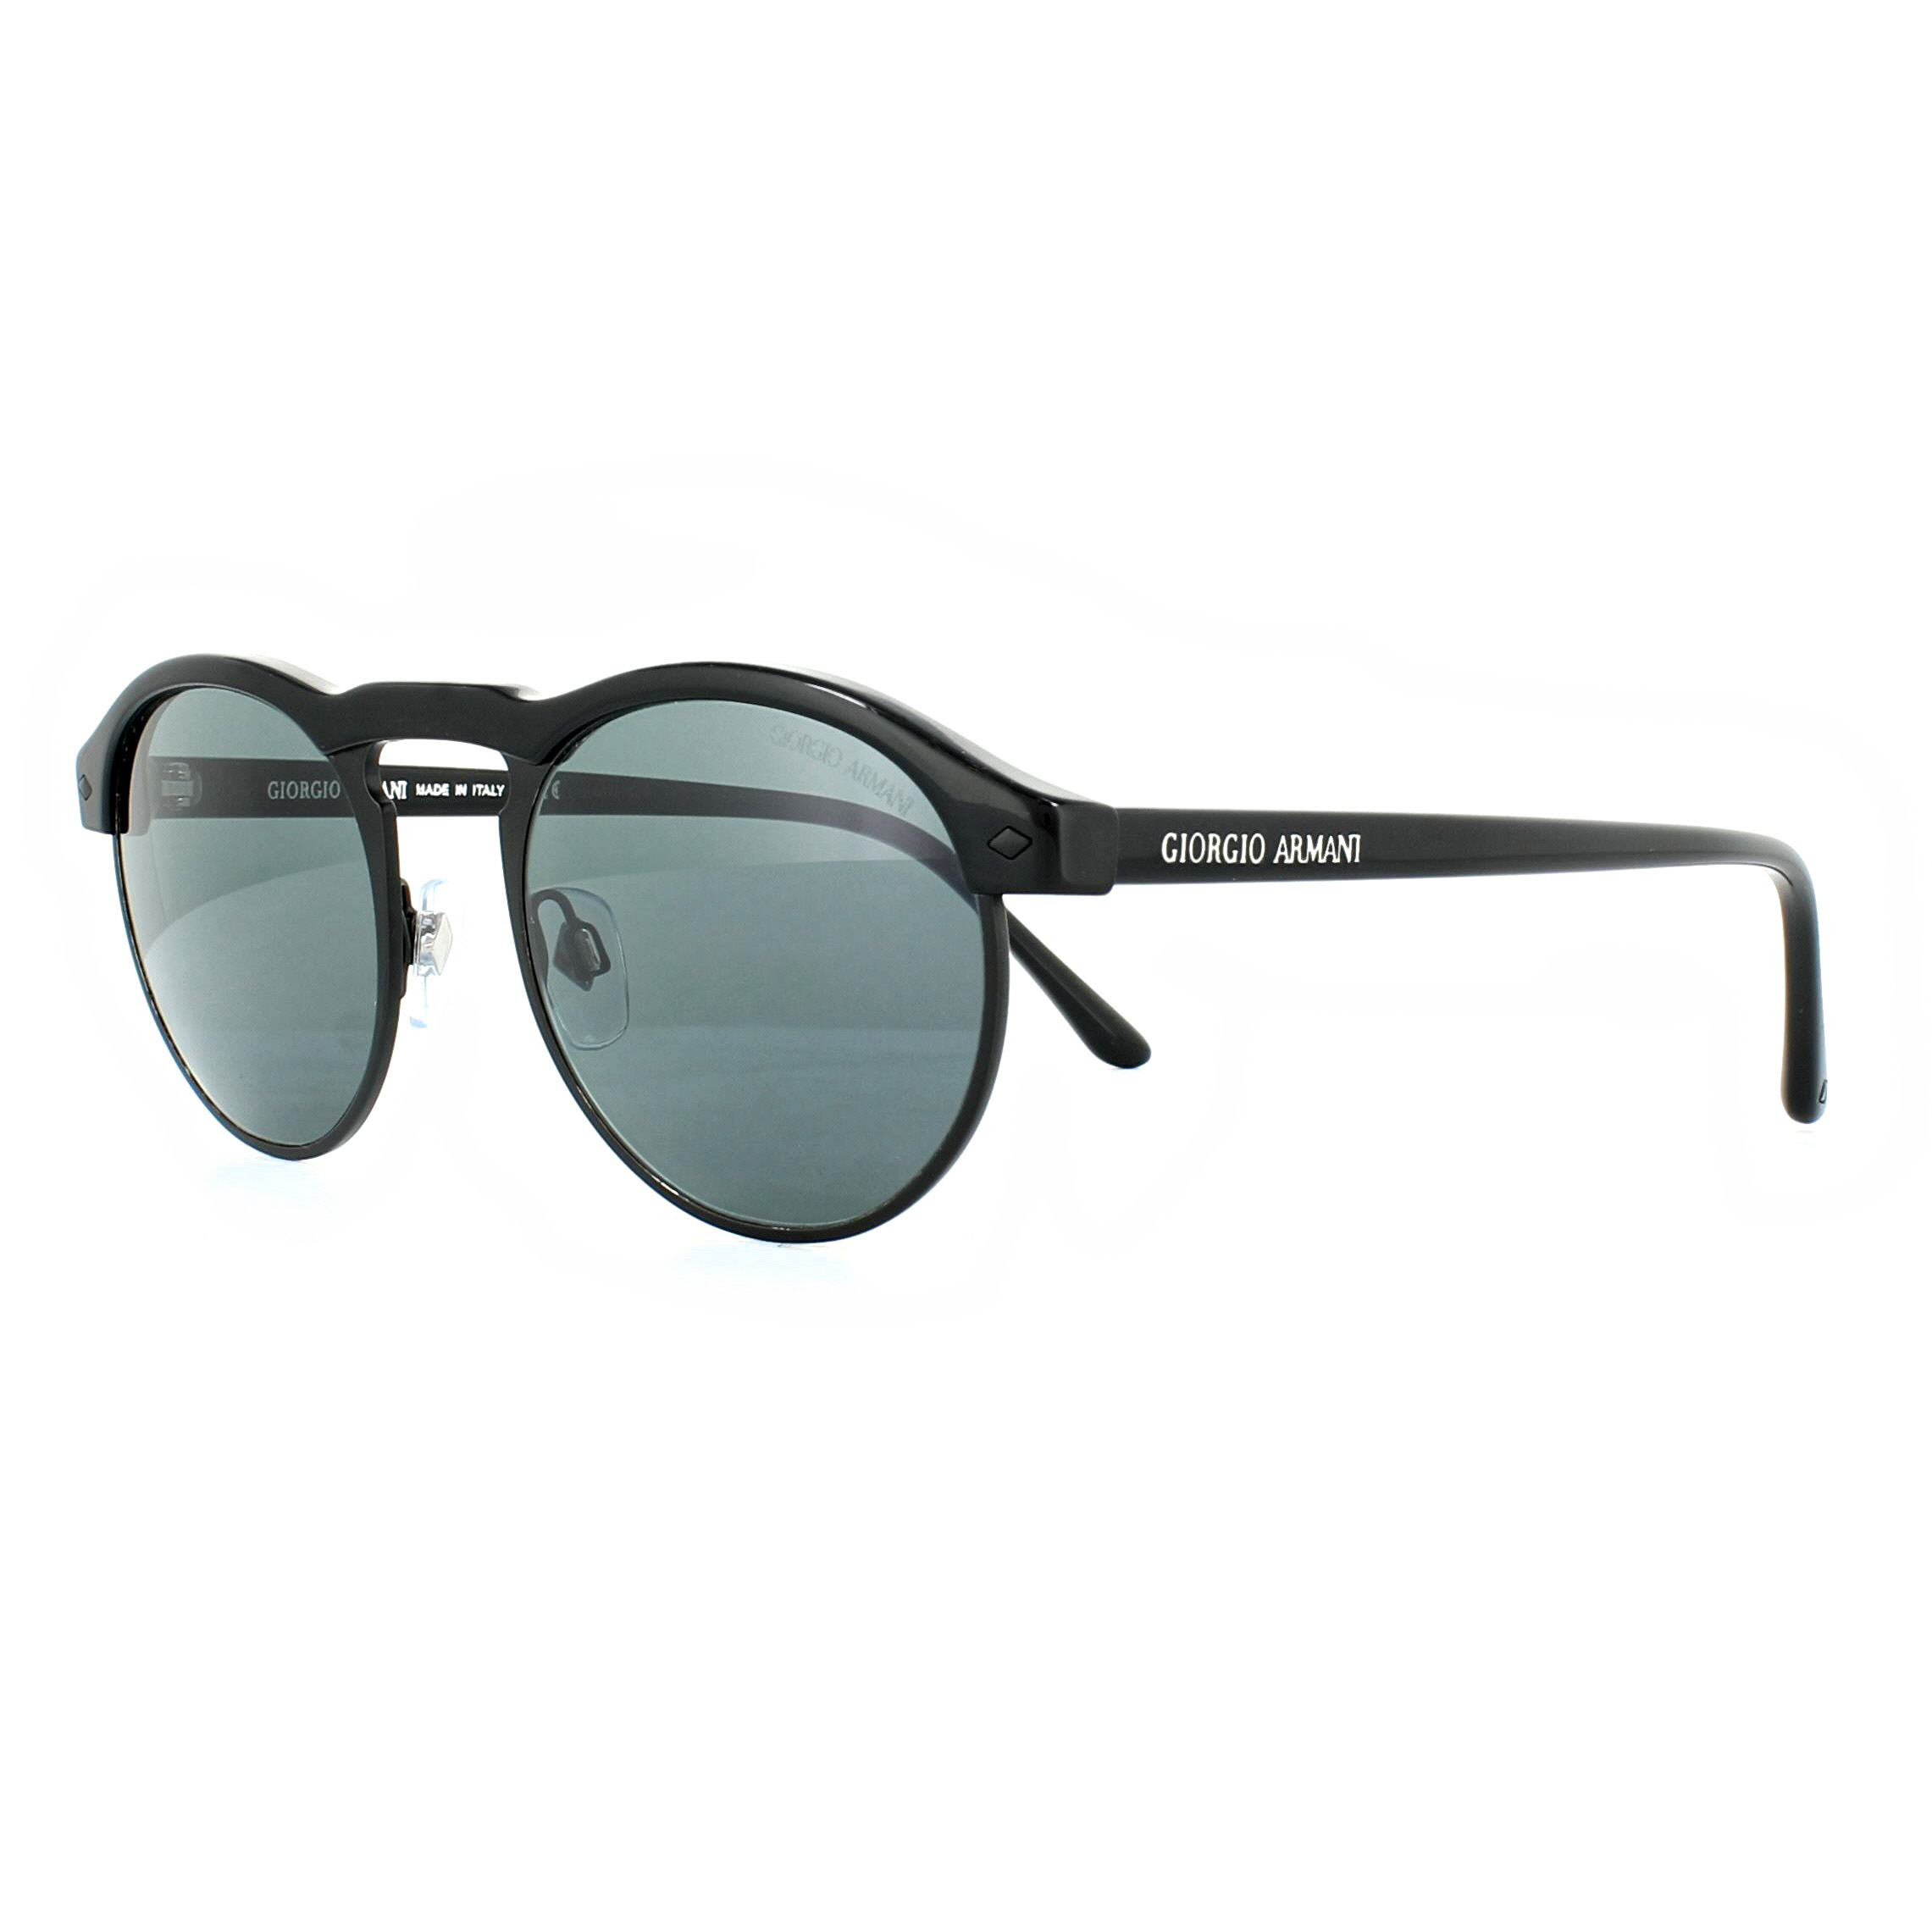 c3d1eda29429 Sentinel Giorgio Armani Sunglasses AR8090 5017R5 Matte Black and Shiny  Black Grey